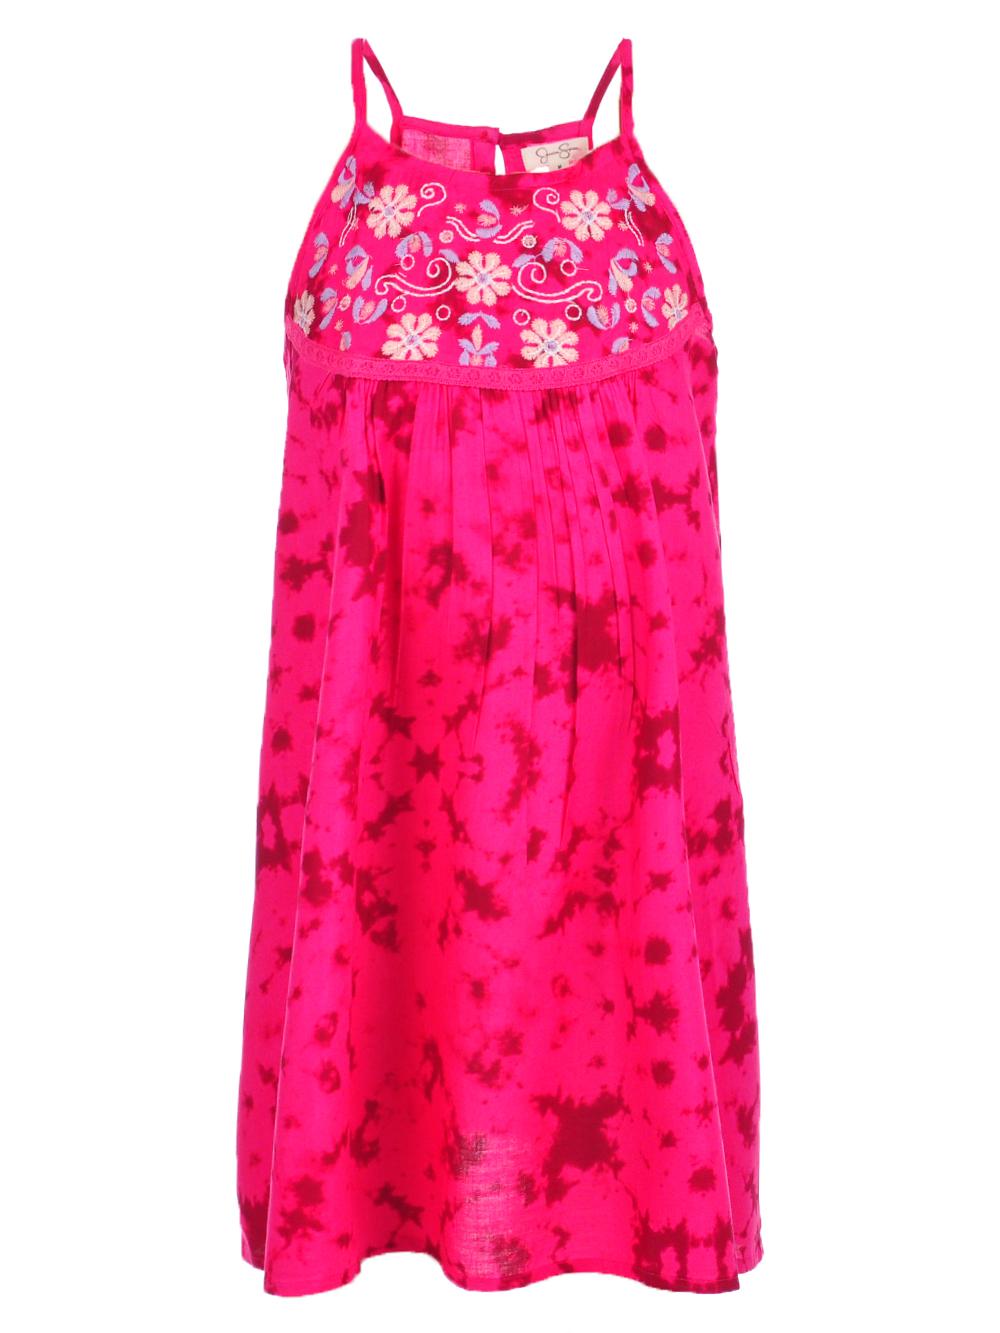 Jessica Simpson Girls Dress